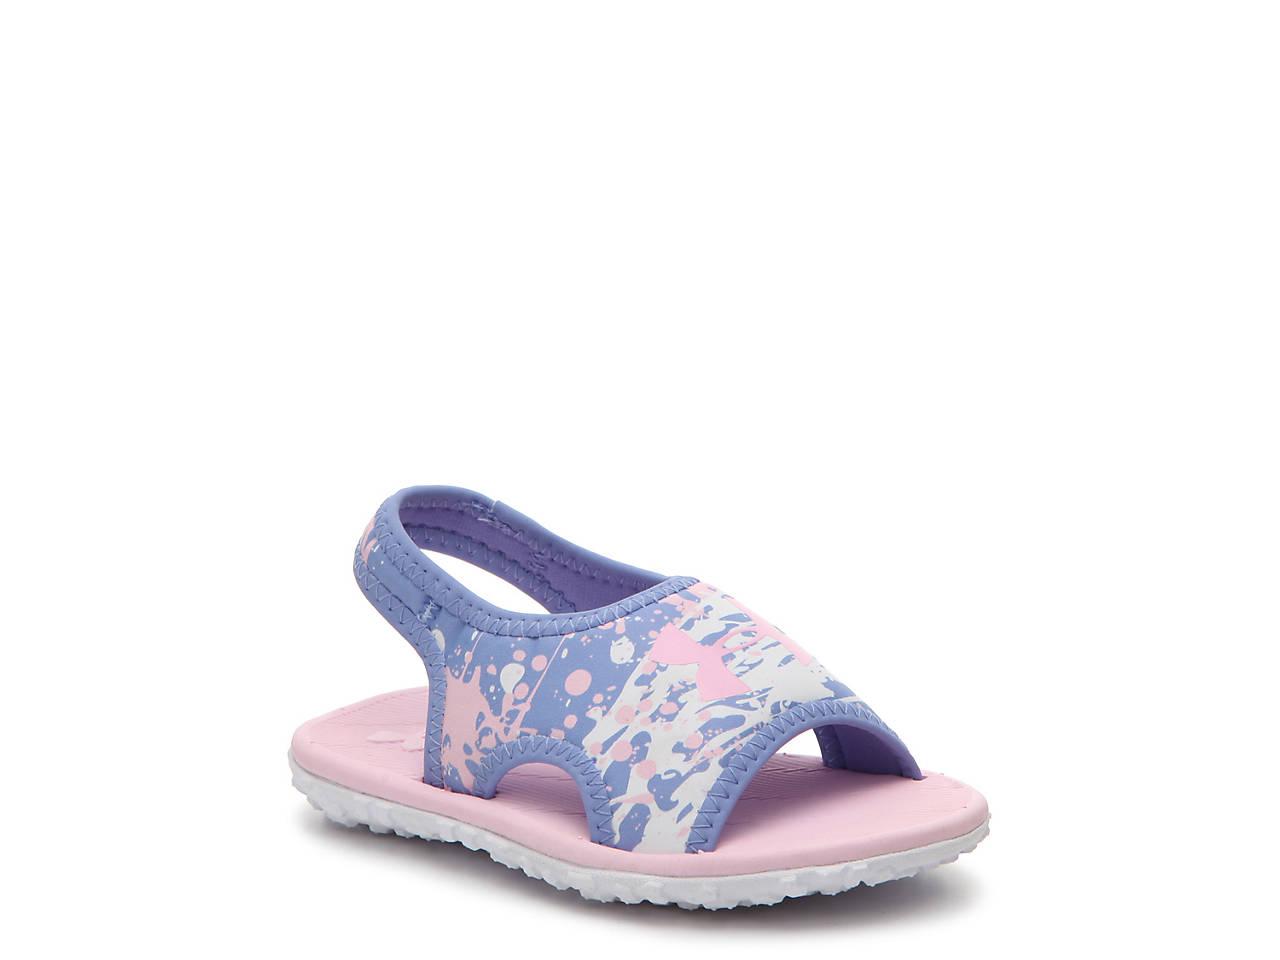 eca0dd7d517f Under Armour Fat Tire II Toddler Sandal Kids Shoes